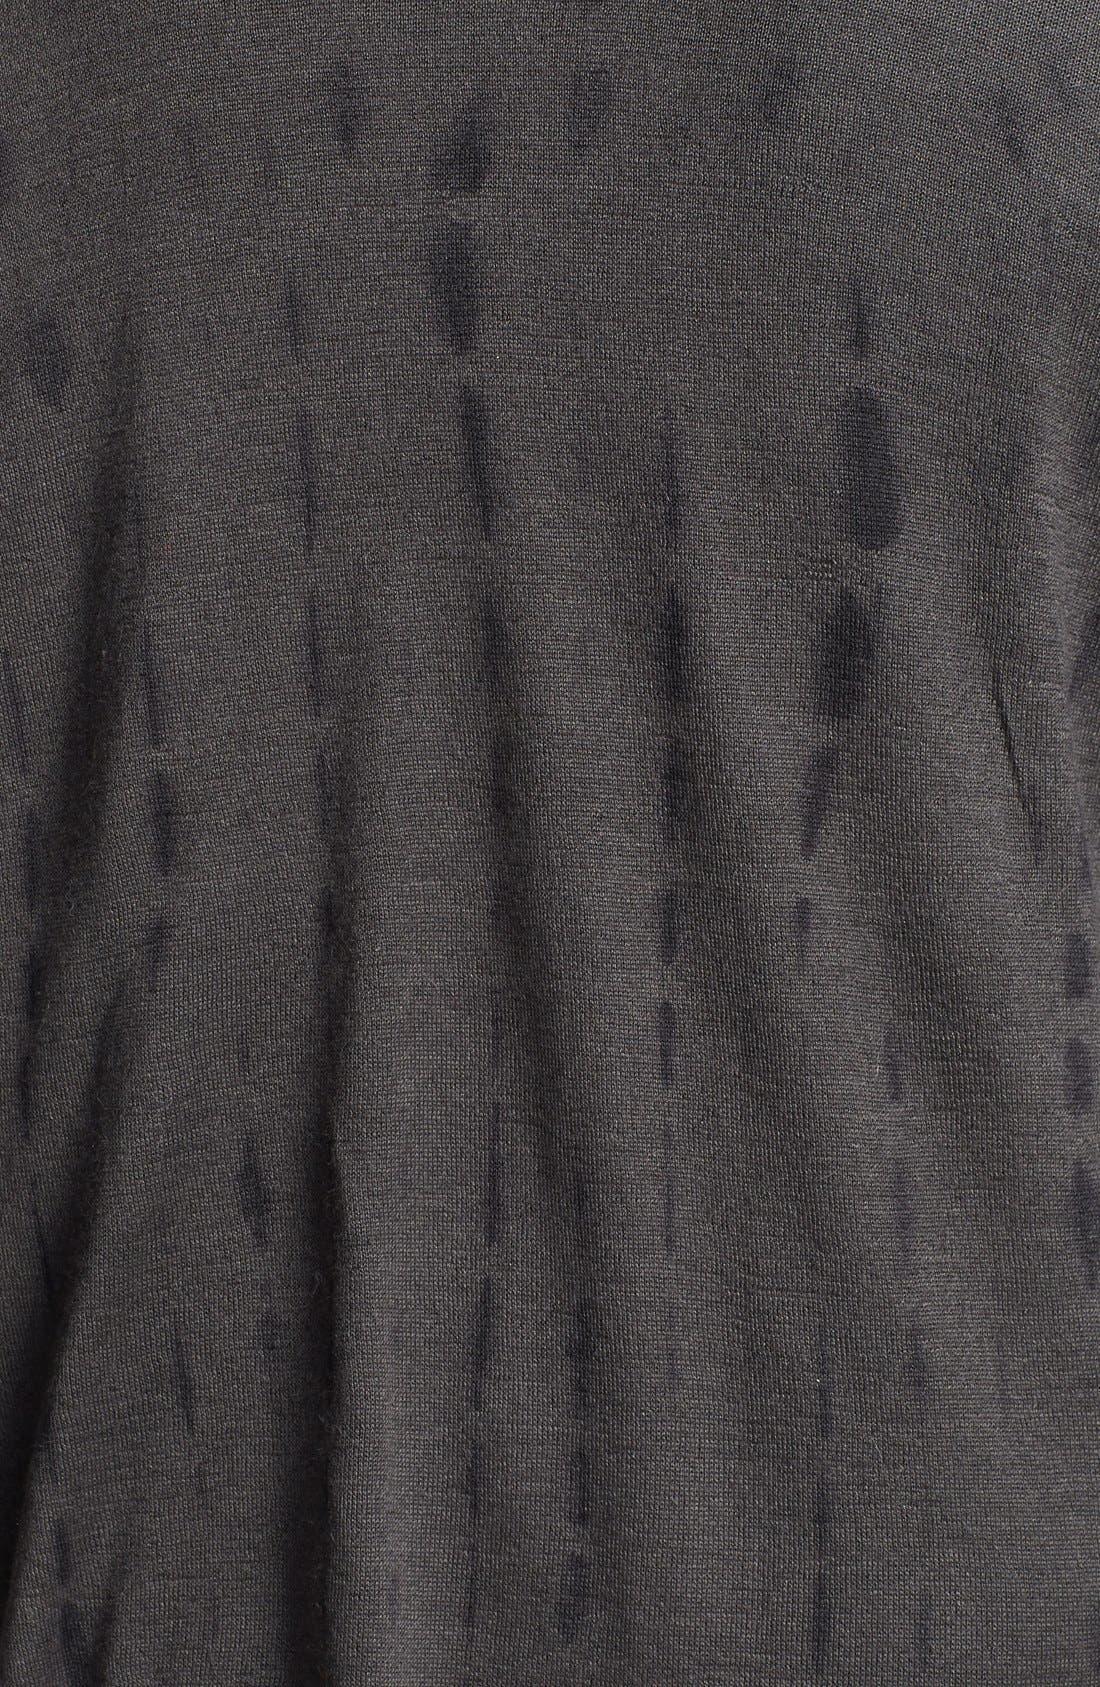 Alternate Image 3  - Eileen Fisher Tie Dye Alpaca & Silk Cardigan (Plus Size)